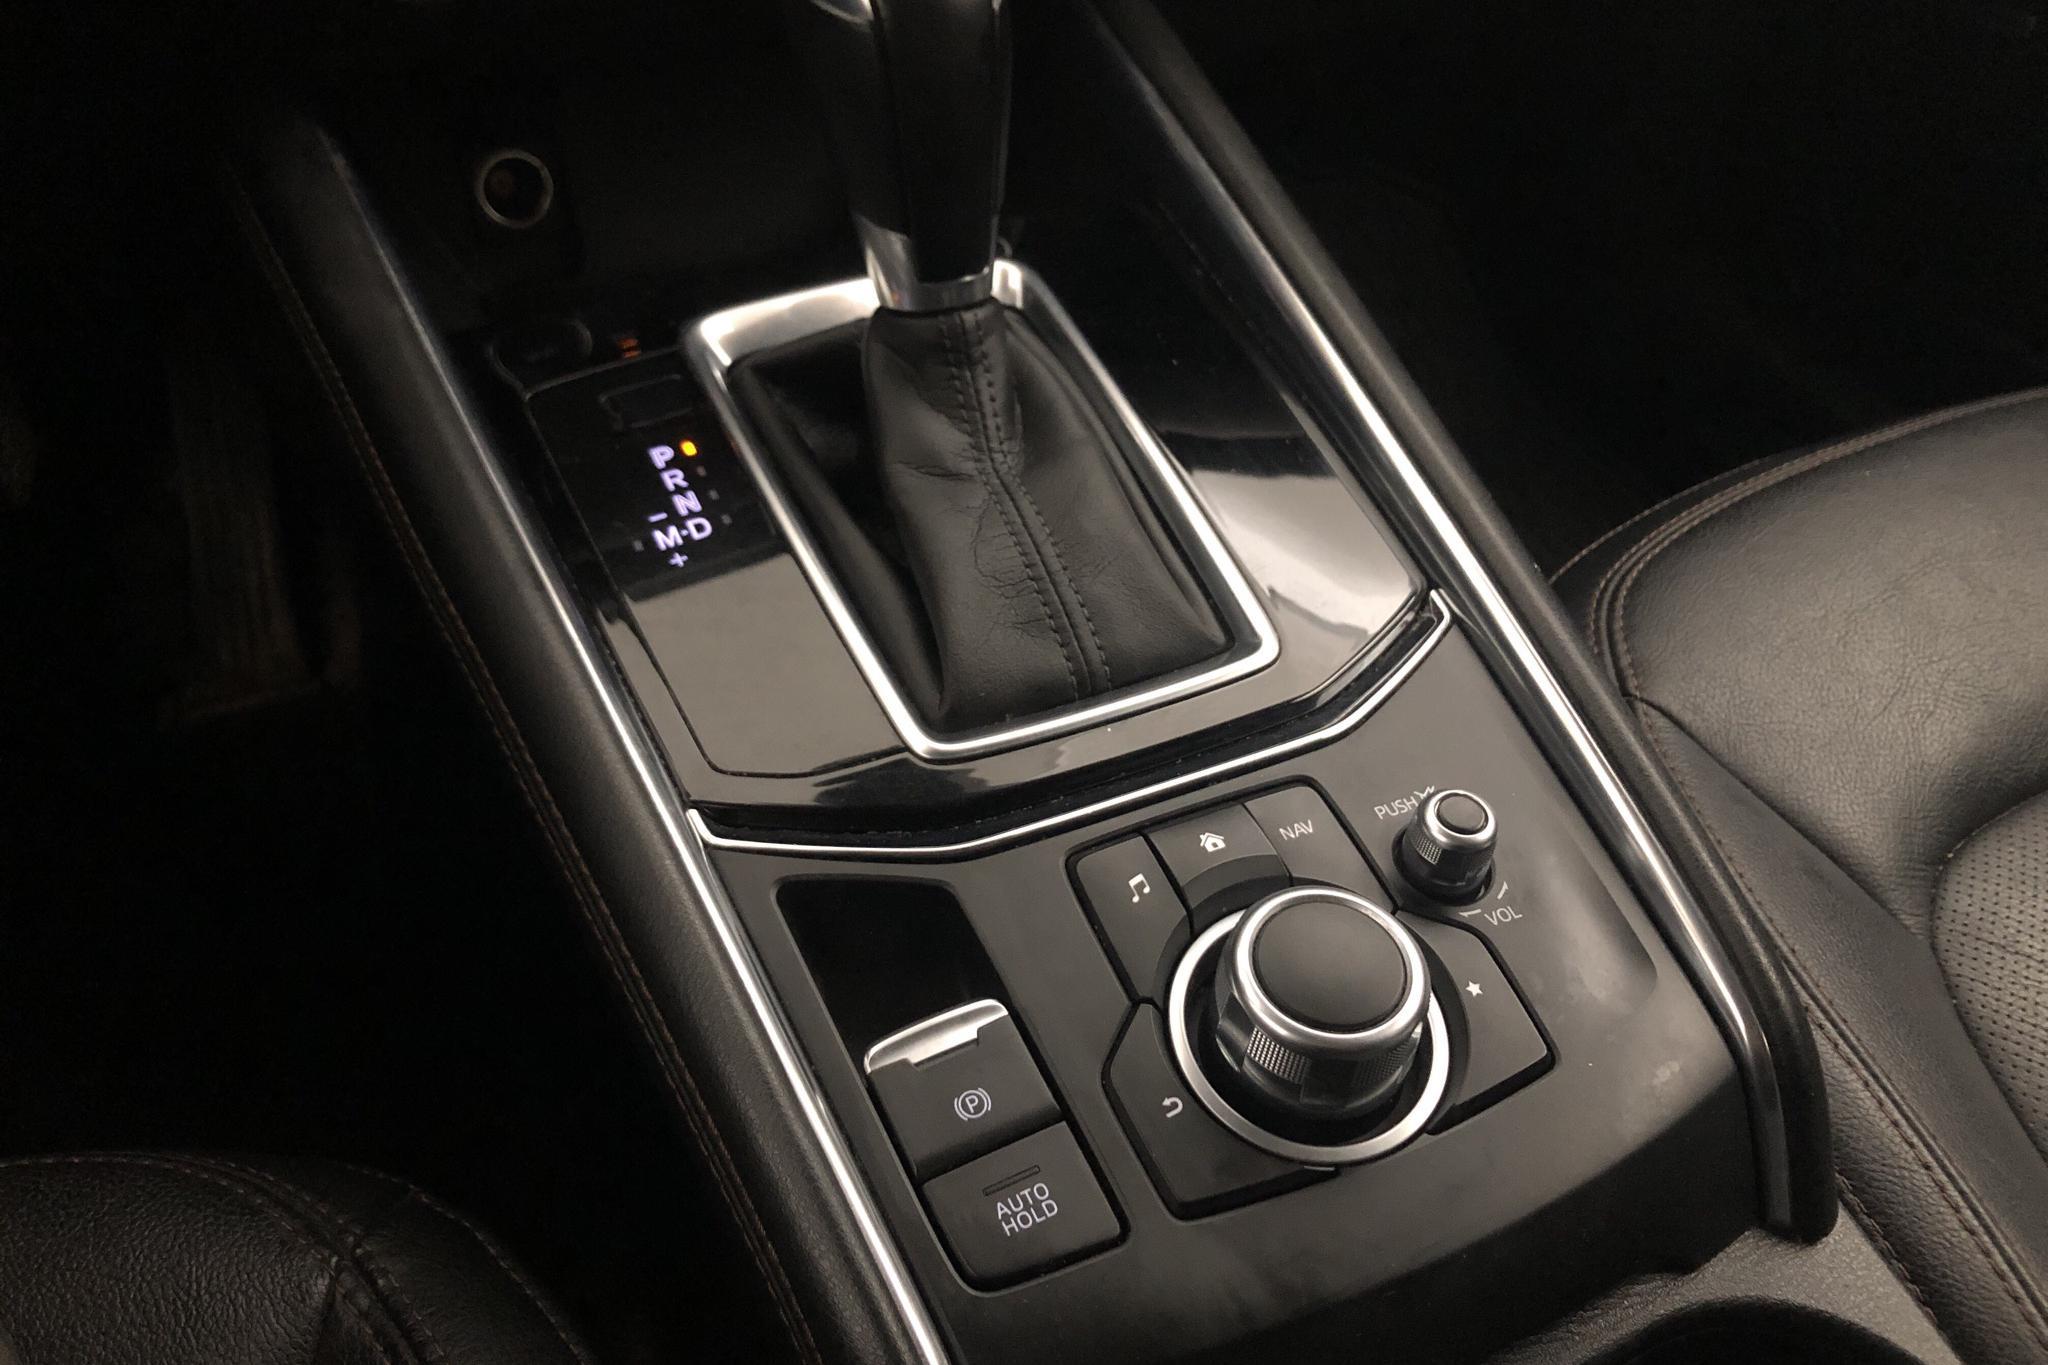 Mazda CX-5 2.2 DE AWD (175hk) - 23 812 mil - Automat - grå - 2017